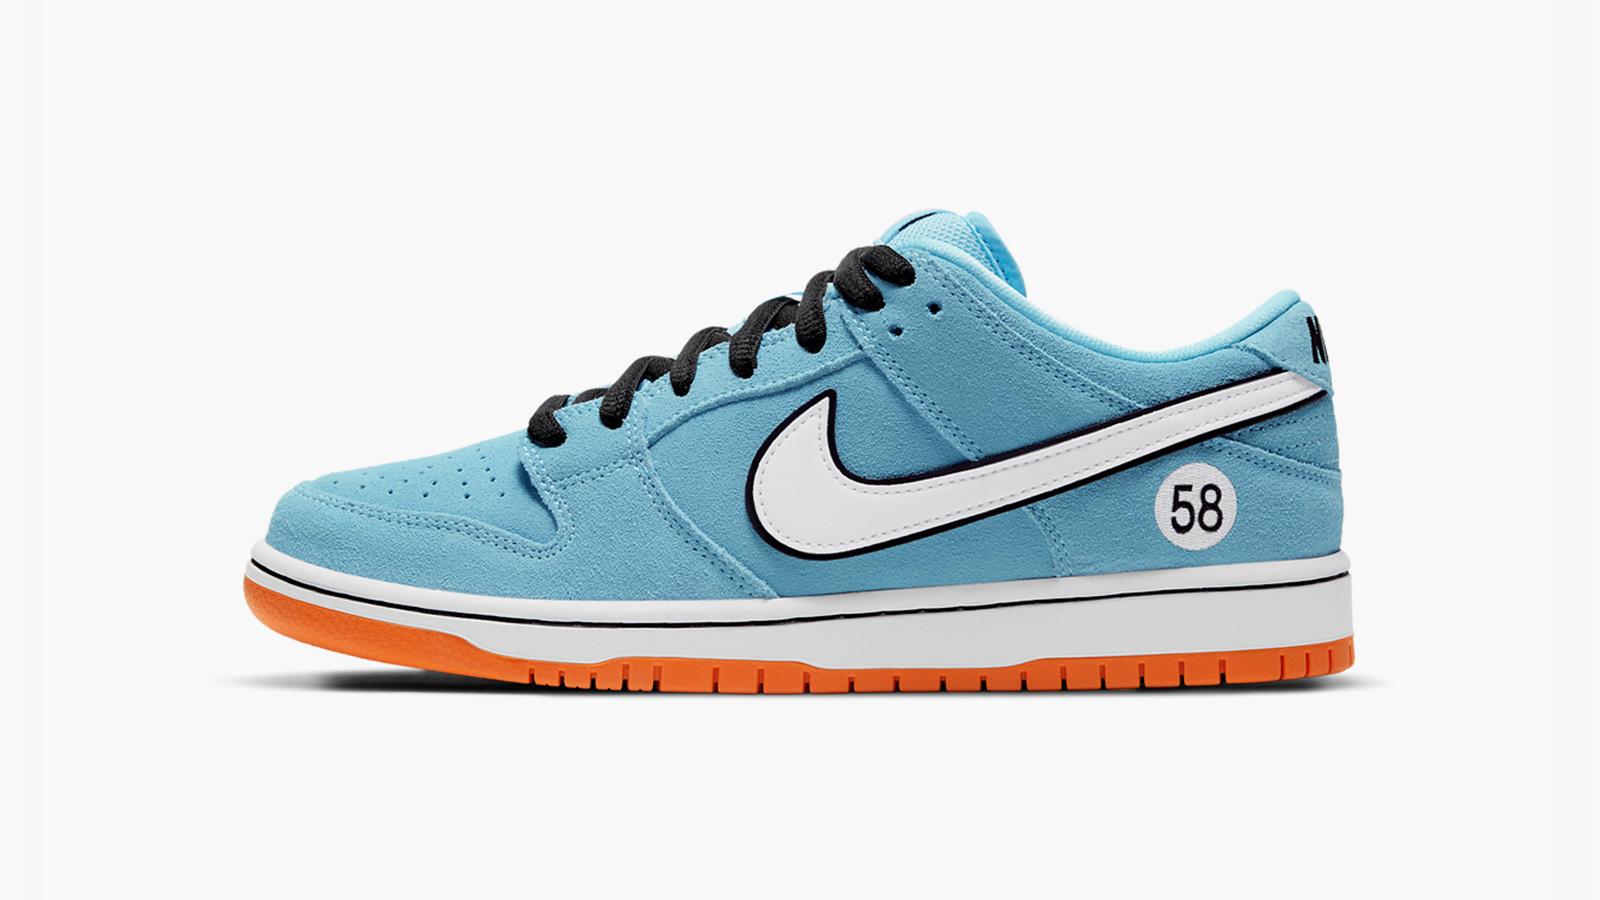 Nike SB Dunk Low 'Gulf'